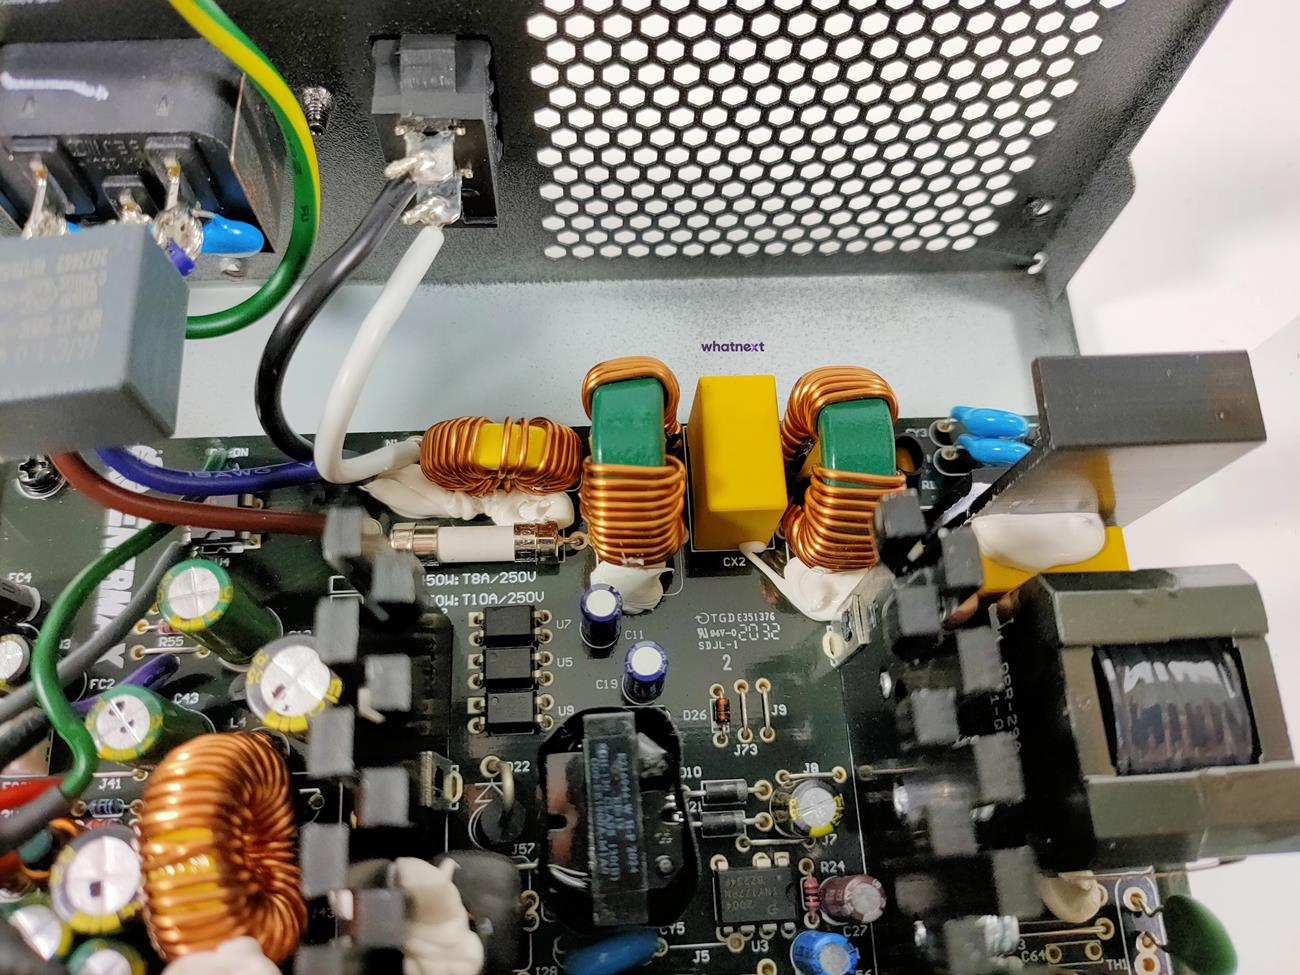 test Enermax CyberBron 700W, recenzja Enermax CyberBron 700W, opinia Enermax CyberBron 700W